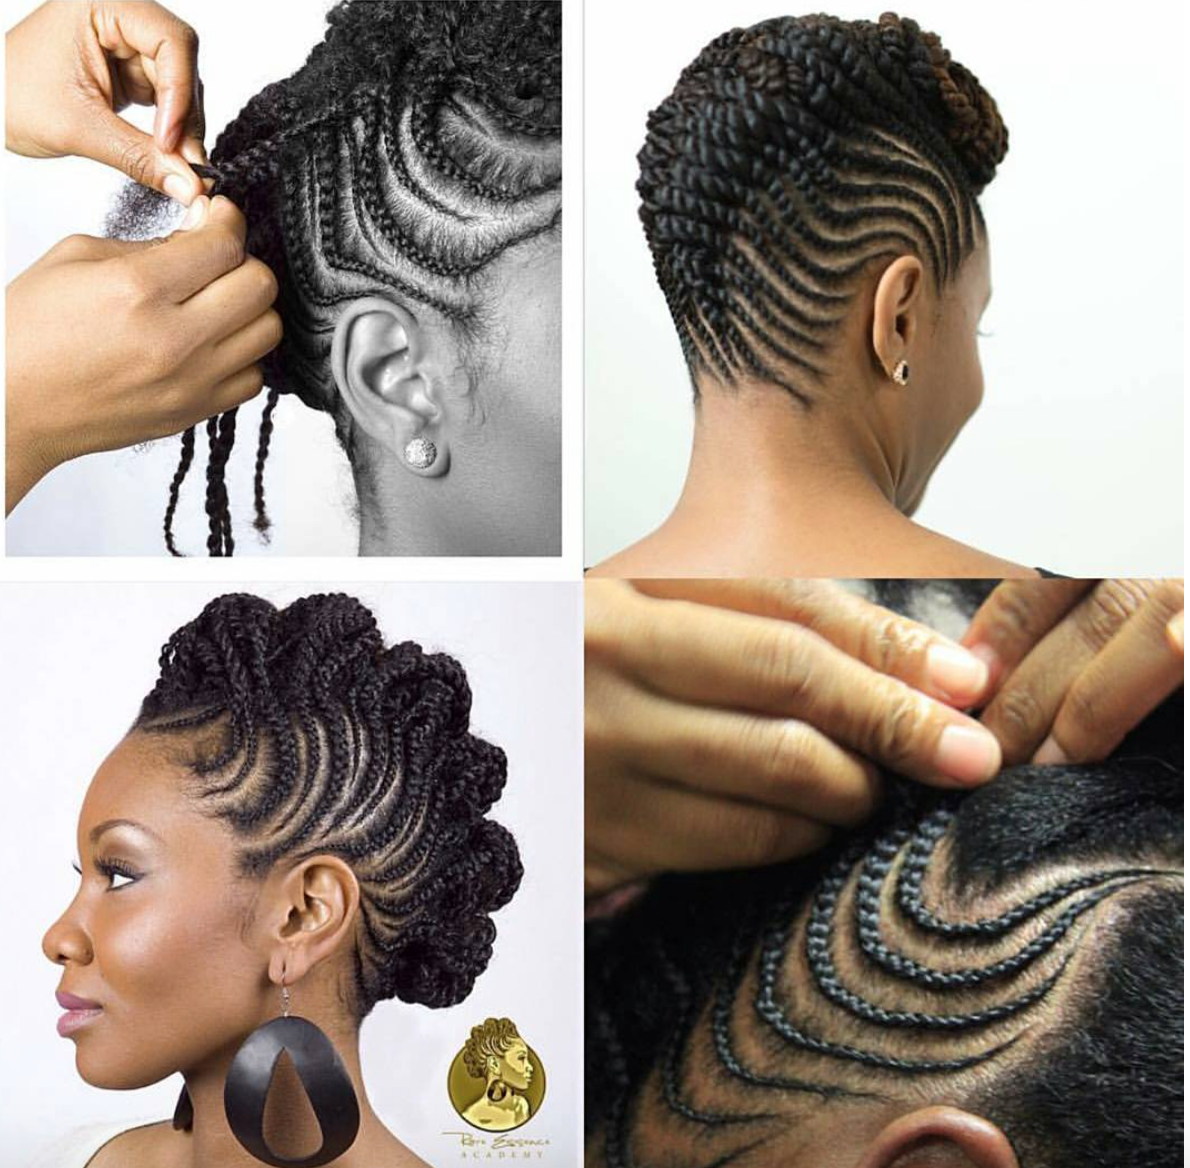 Pin by limpho moleleki on braiding frenzy pinterest hair style